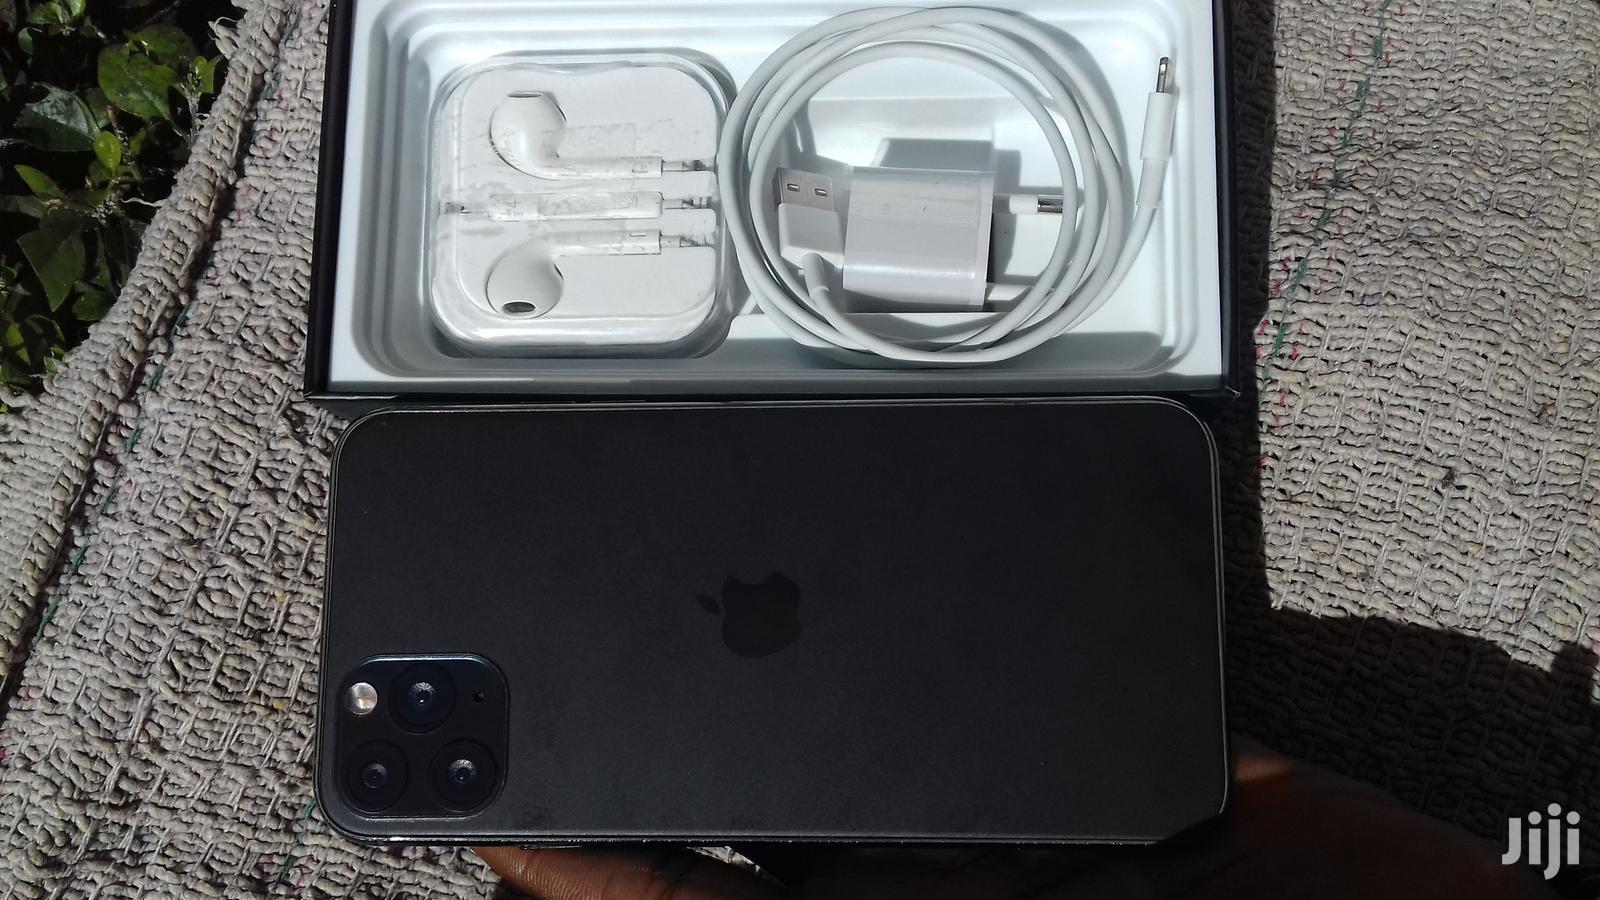 Archive: Apple iPhone 11 Pro Max 256 GB Black